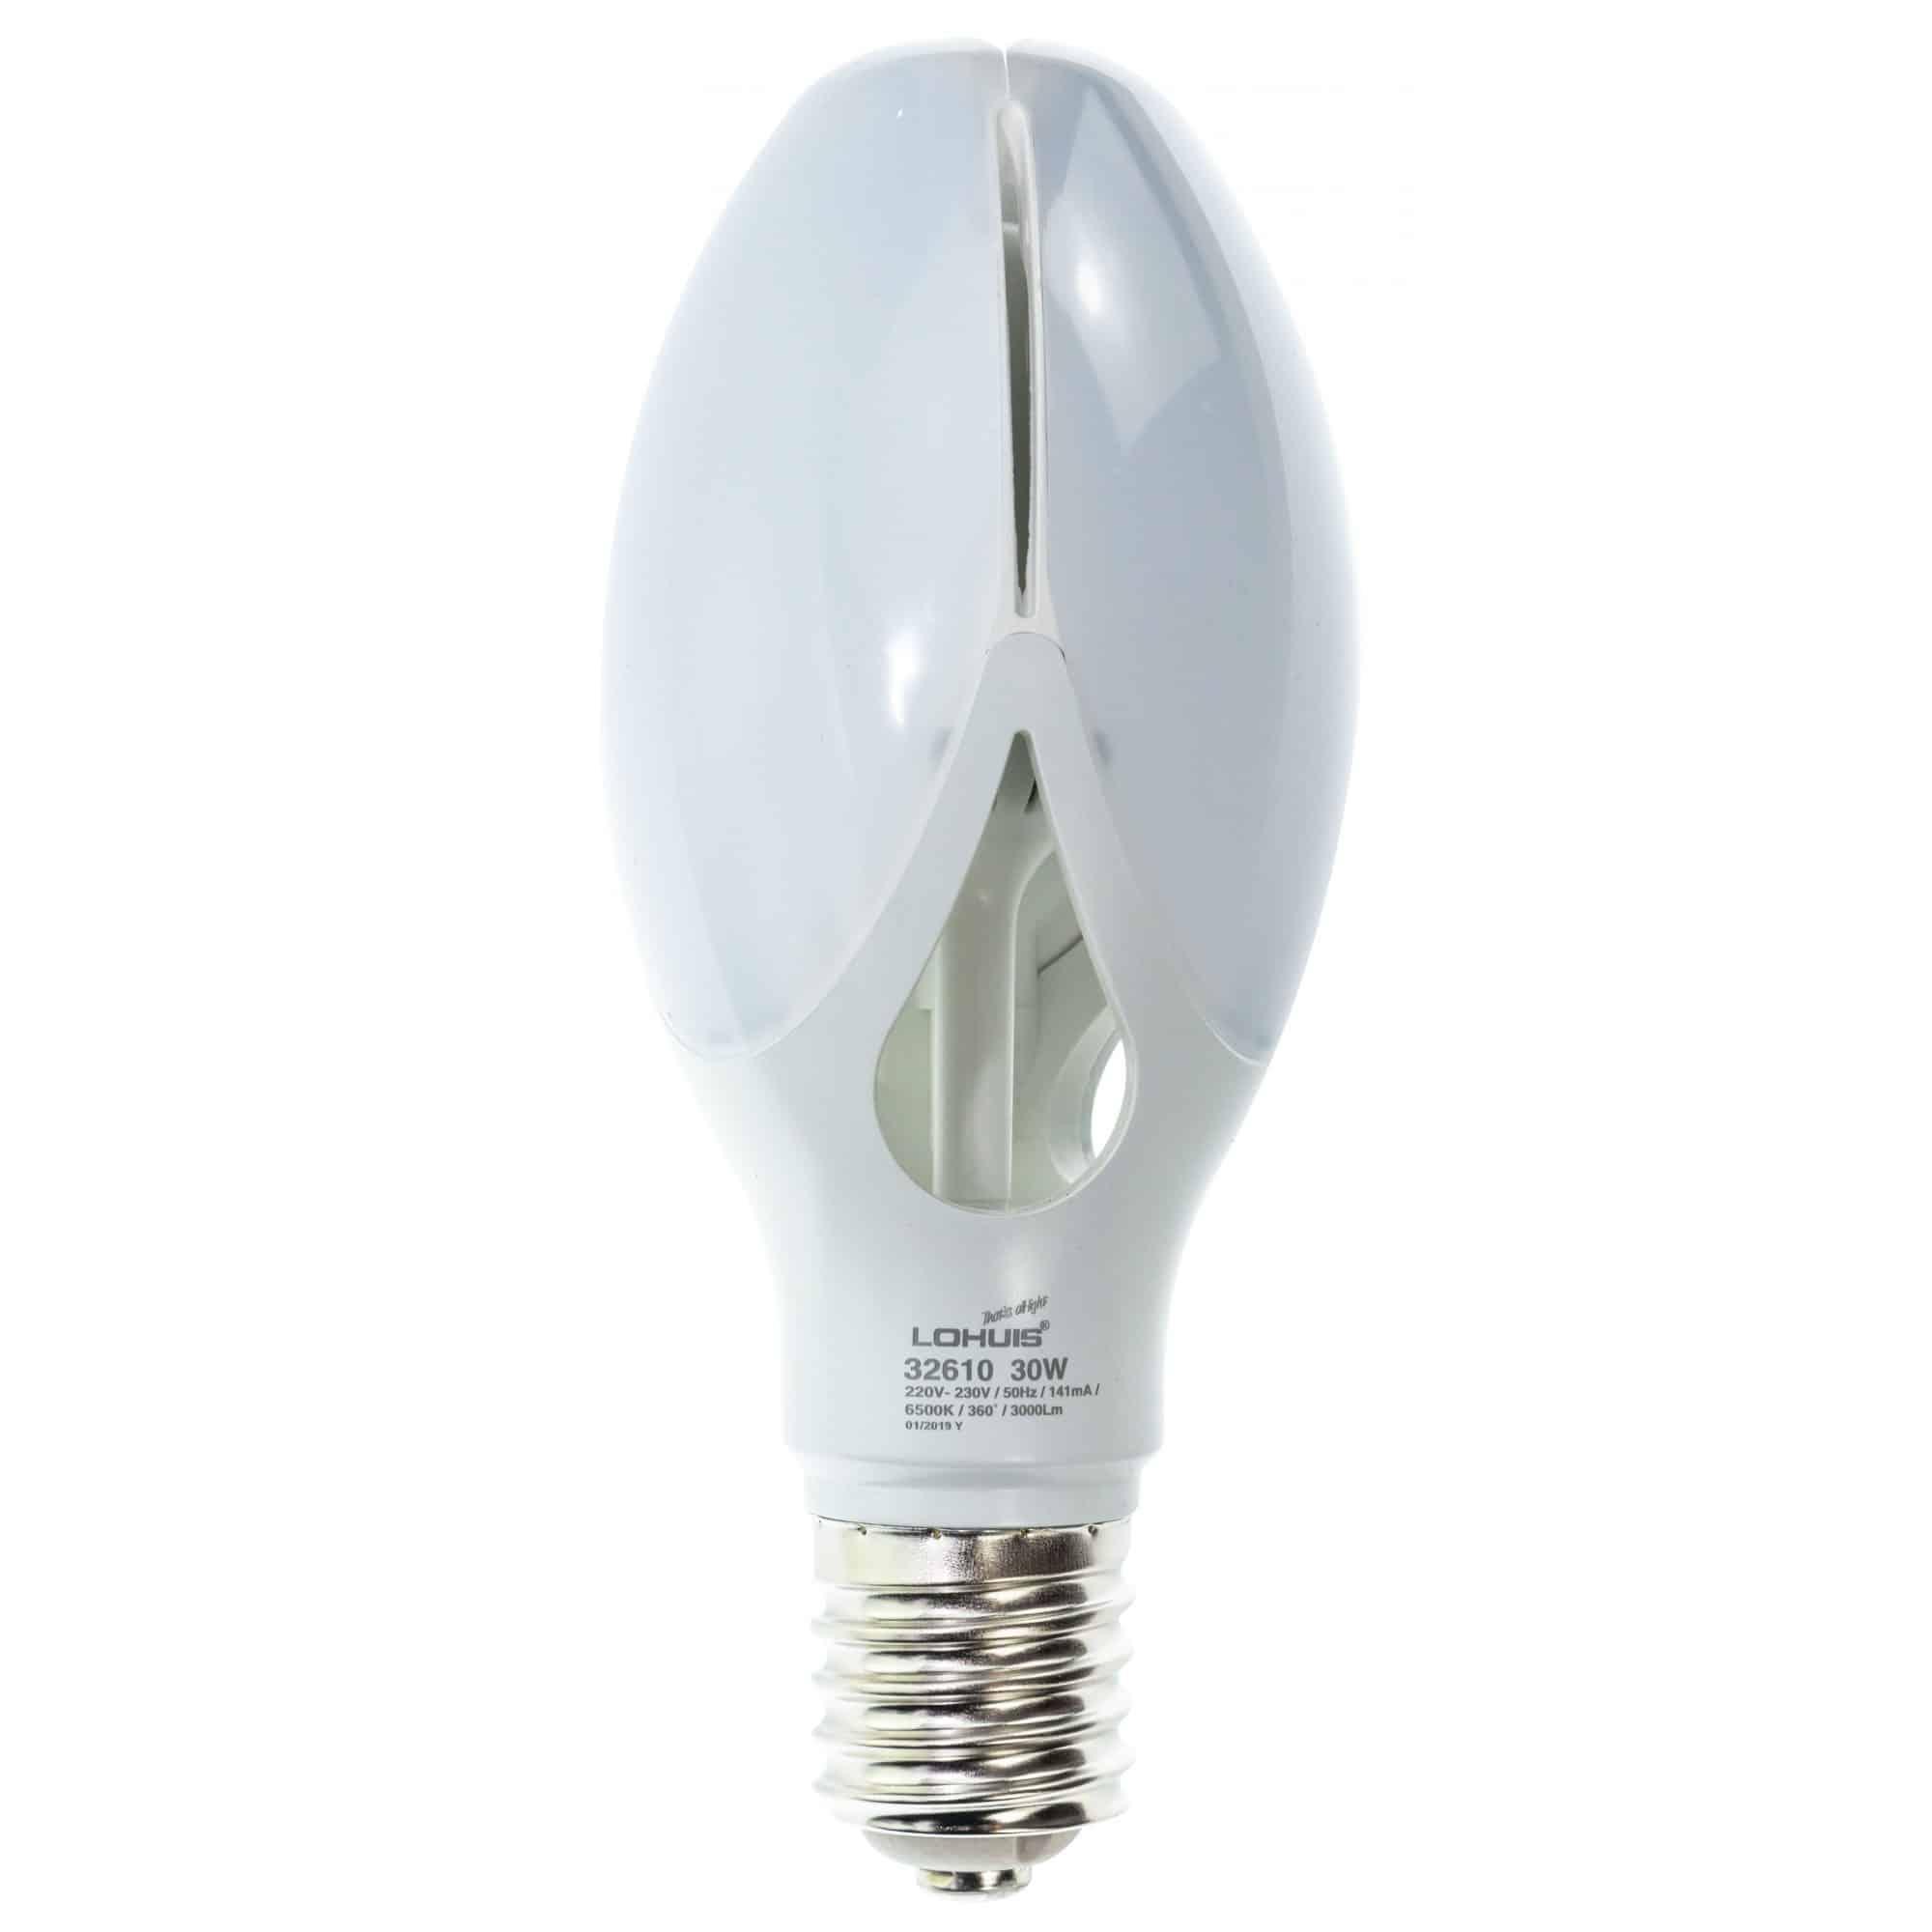 Bec LED Lohuis Flower, E40, 30W, 3000 lm, lumina rece 6500 K mathaus 2021